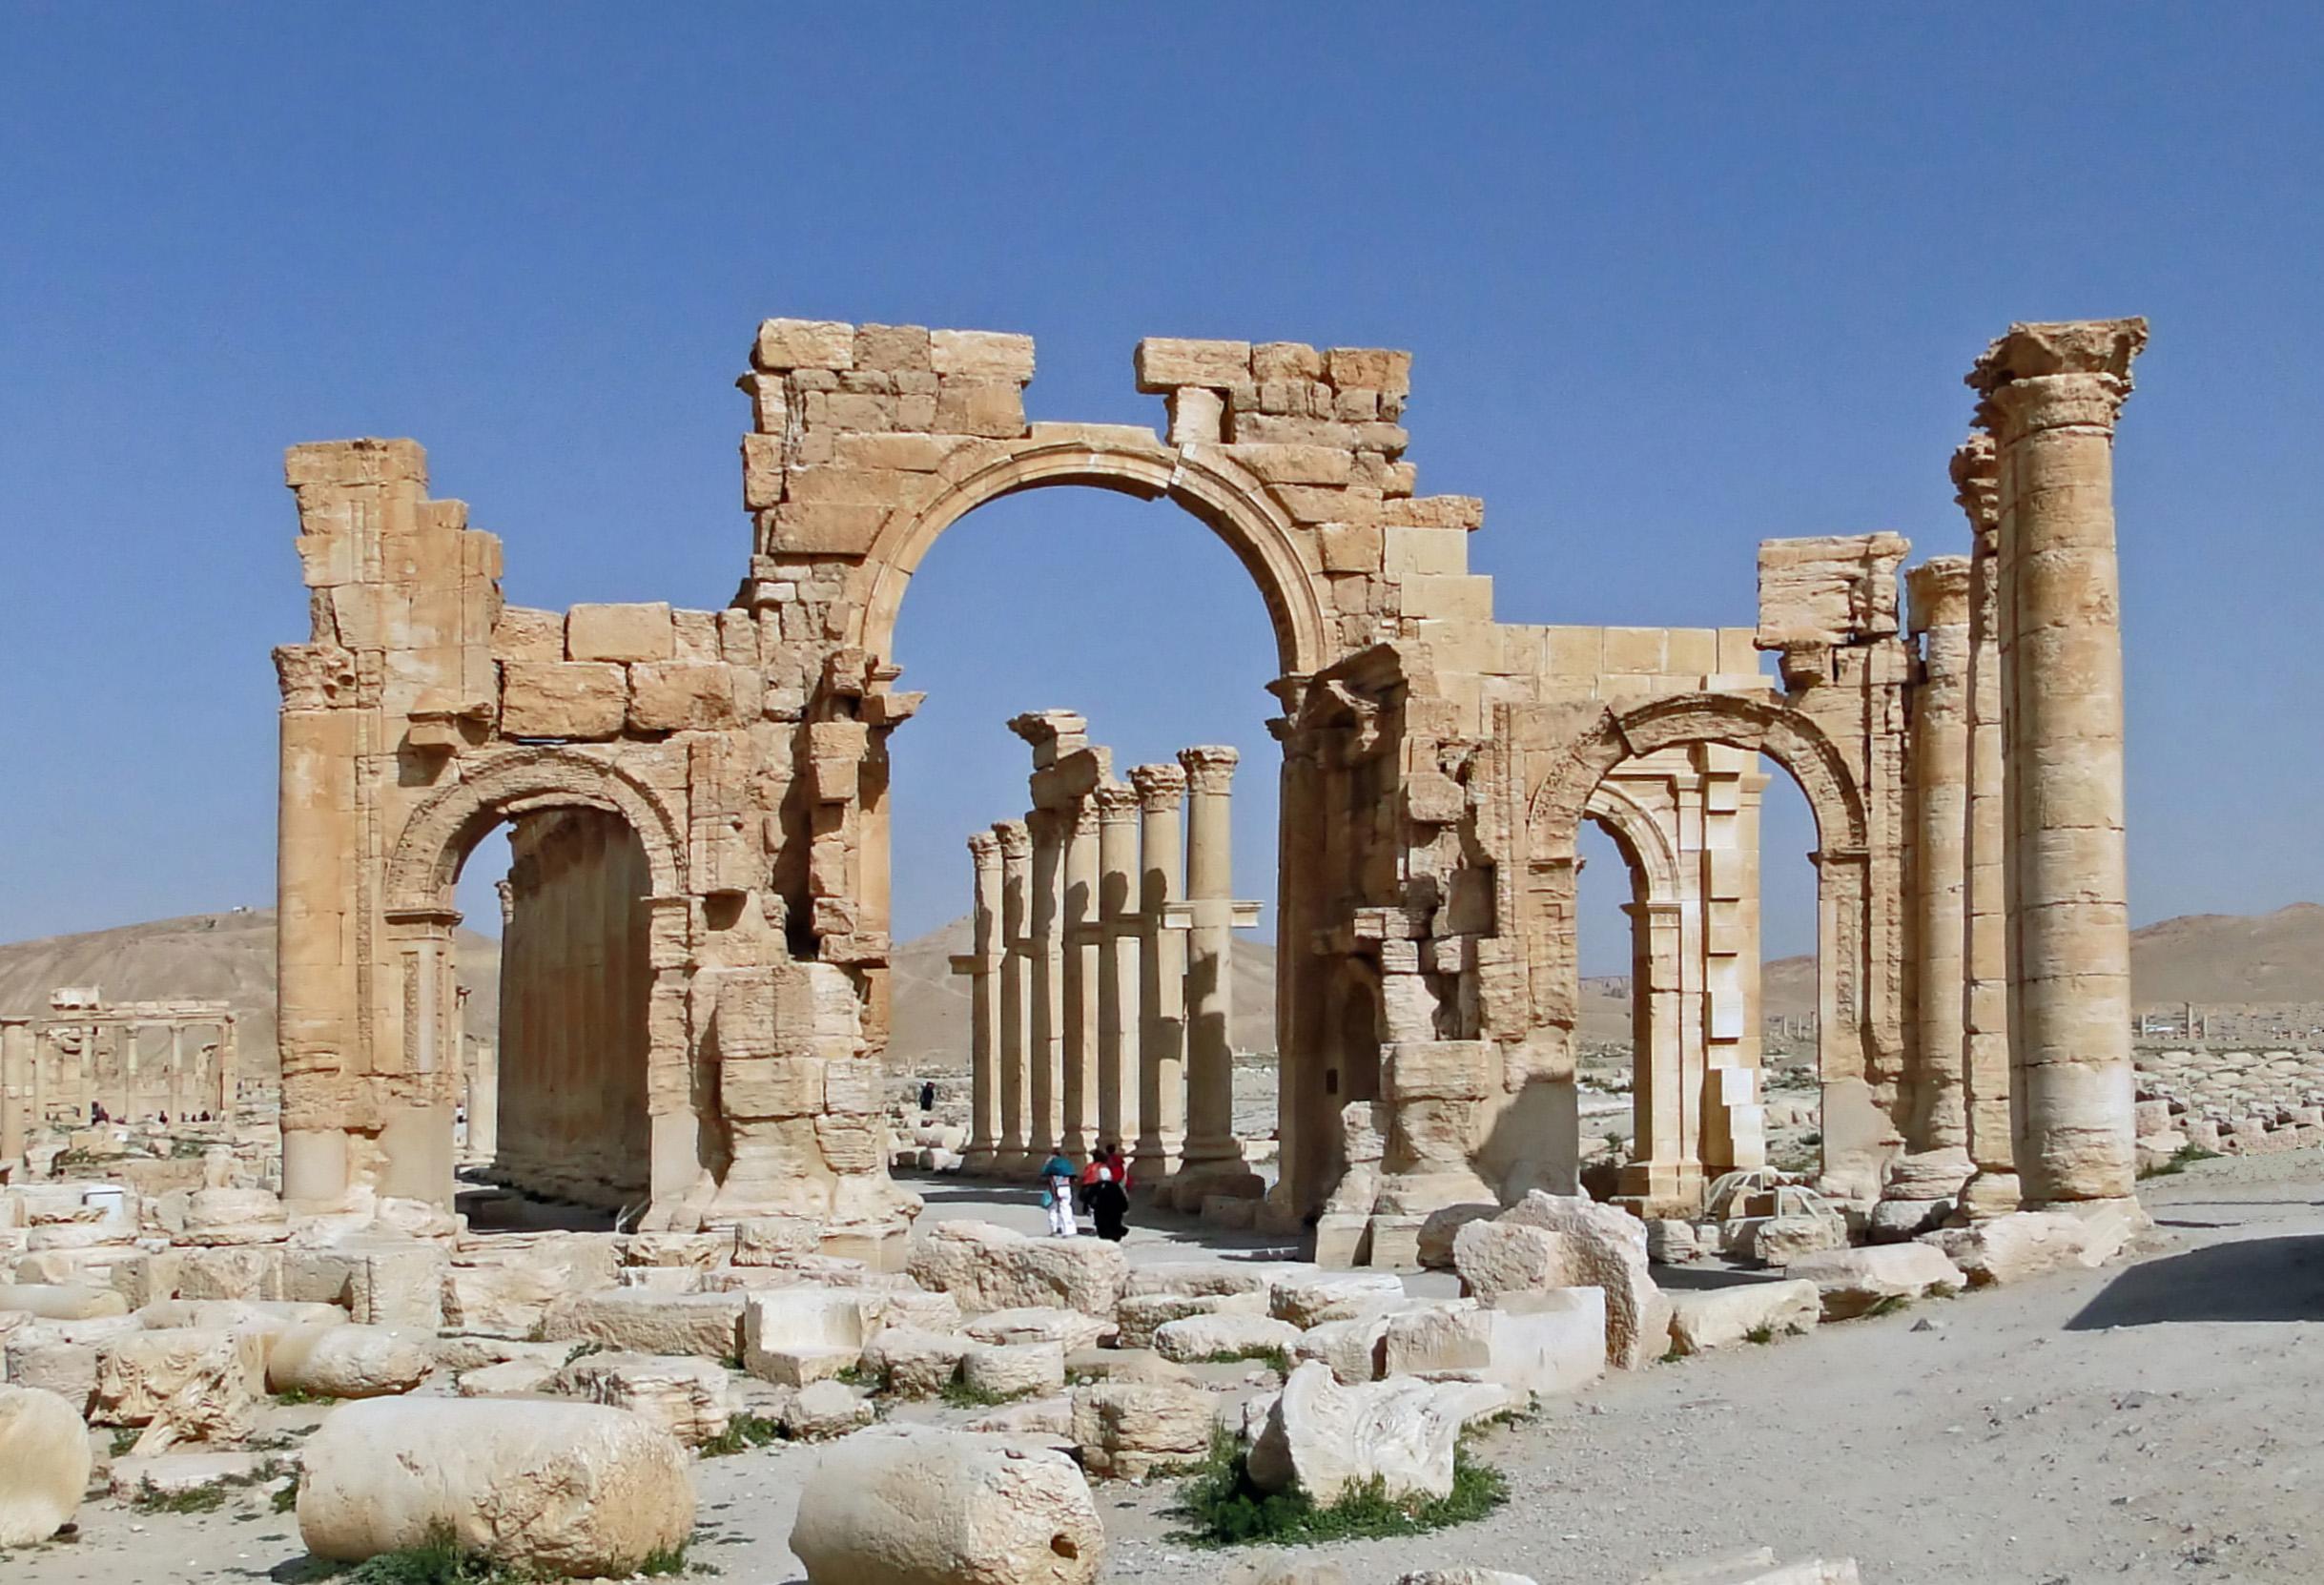 Source: WikiMedia, https://upload.wikimedia.org/wikipedia/commons/2/21/Palmyra_-_Monumental_Arch.jpg